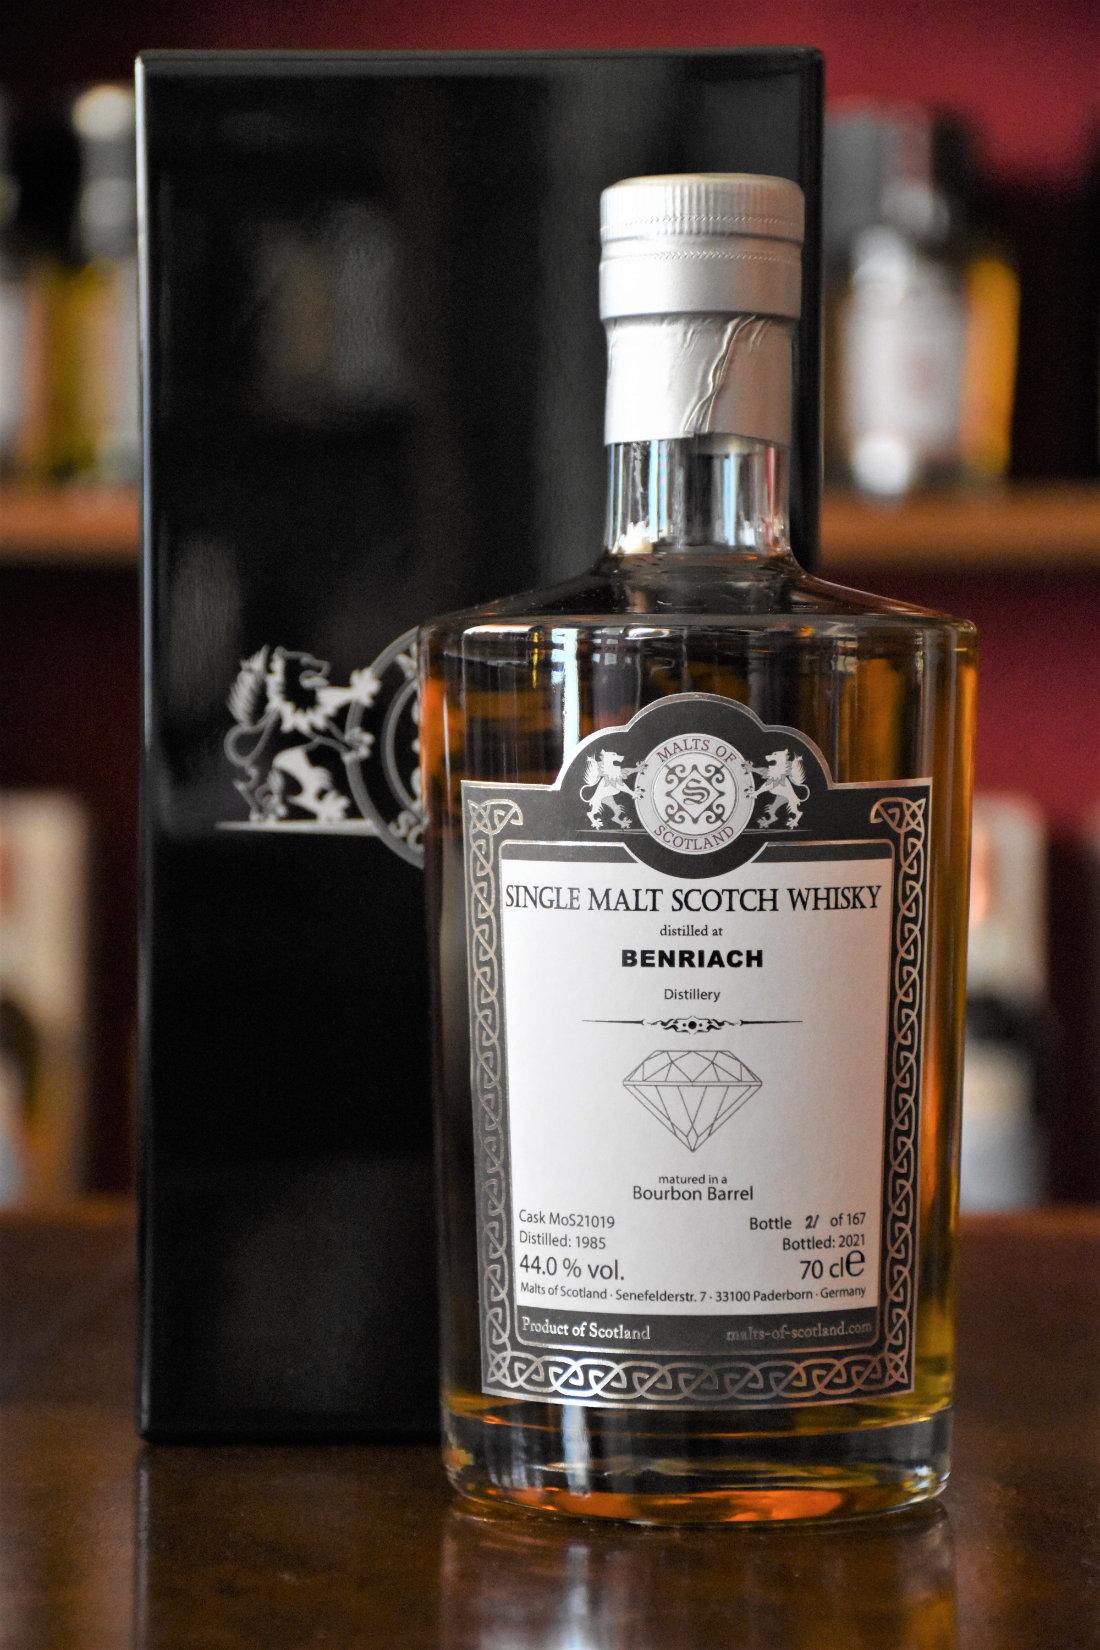 Benriach 1985 - Warehouse Diamond - Bourbon Barrel, Cask No. MoS21019, 44% Alc.Vol., Malts of Scotland